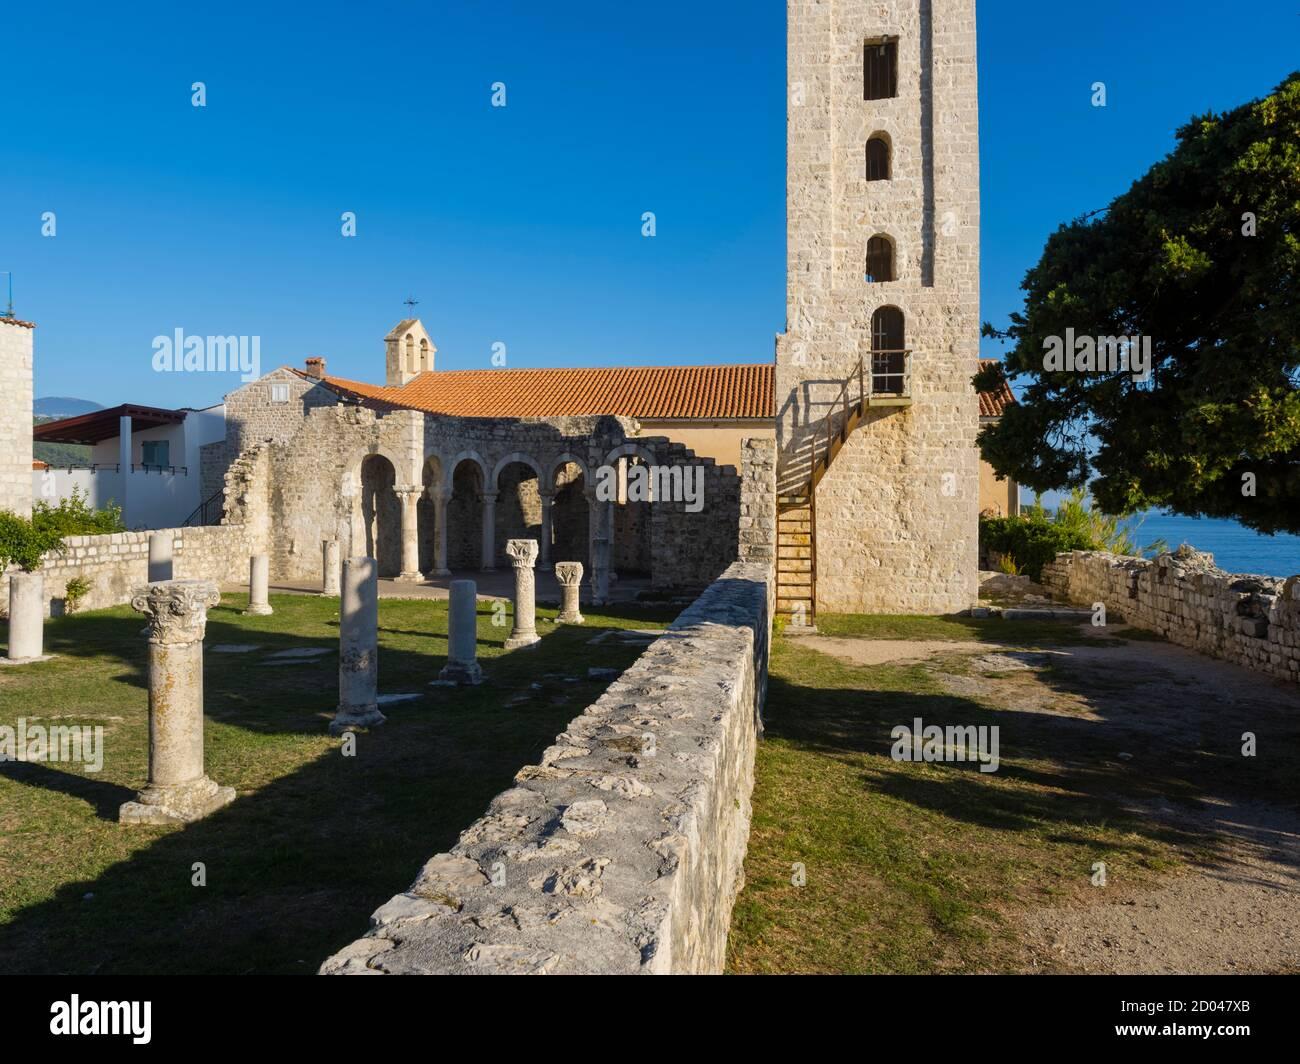 Remains ruins of medieval site in oldtown ruined Basilica of St John Ivan the Evangelist church Rab town on Rab island in Croatia Europe Stock Photo